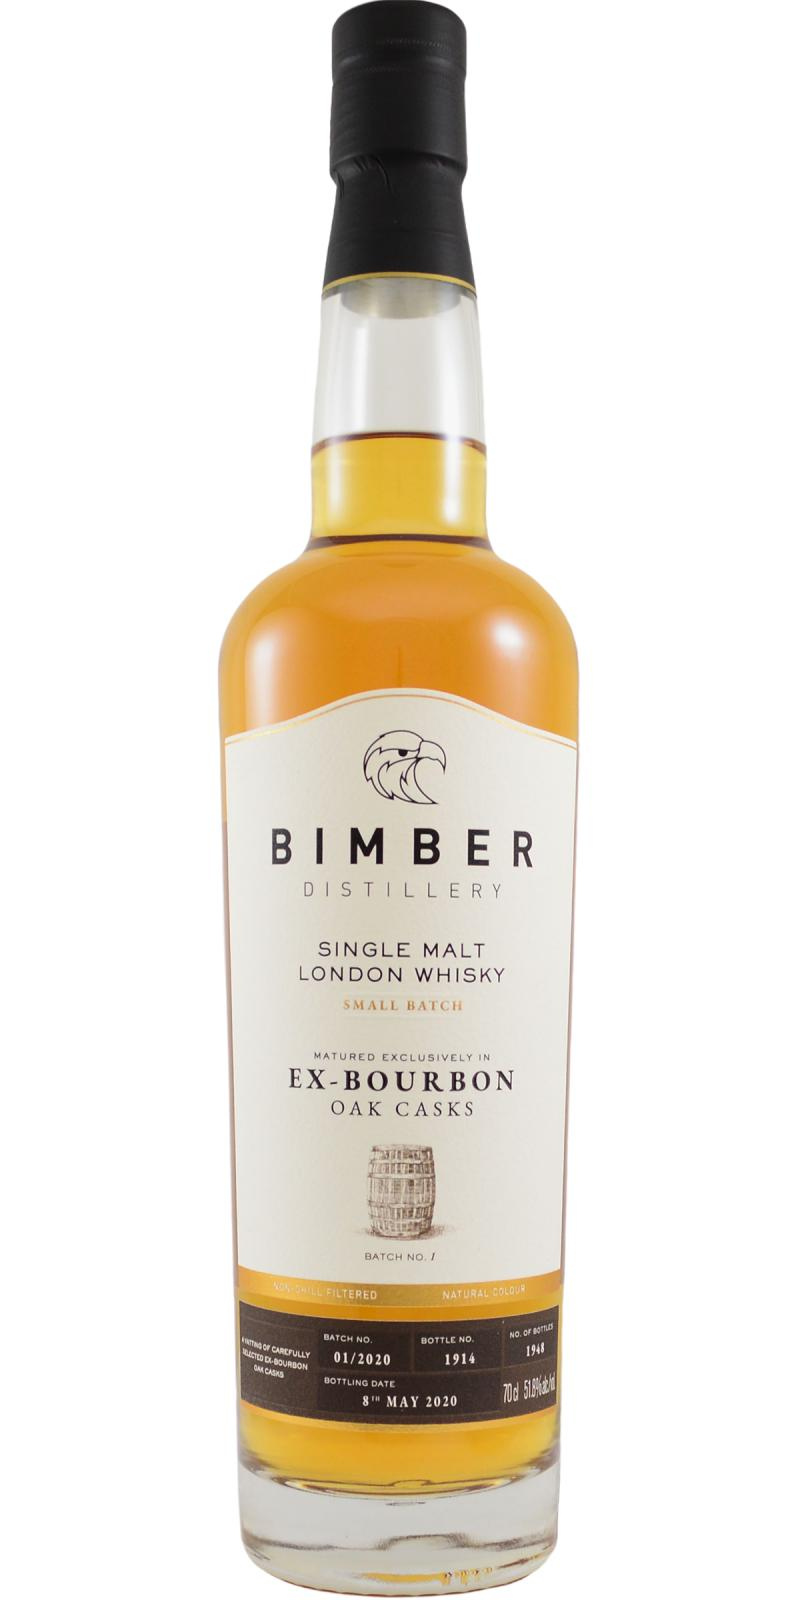 Bimber 2016 - Ex-Bourbon